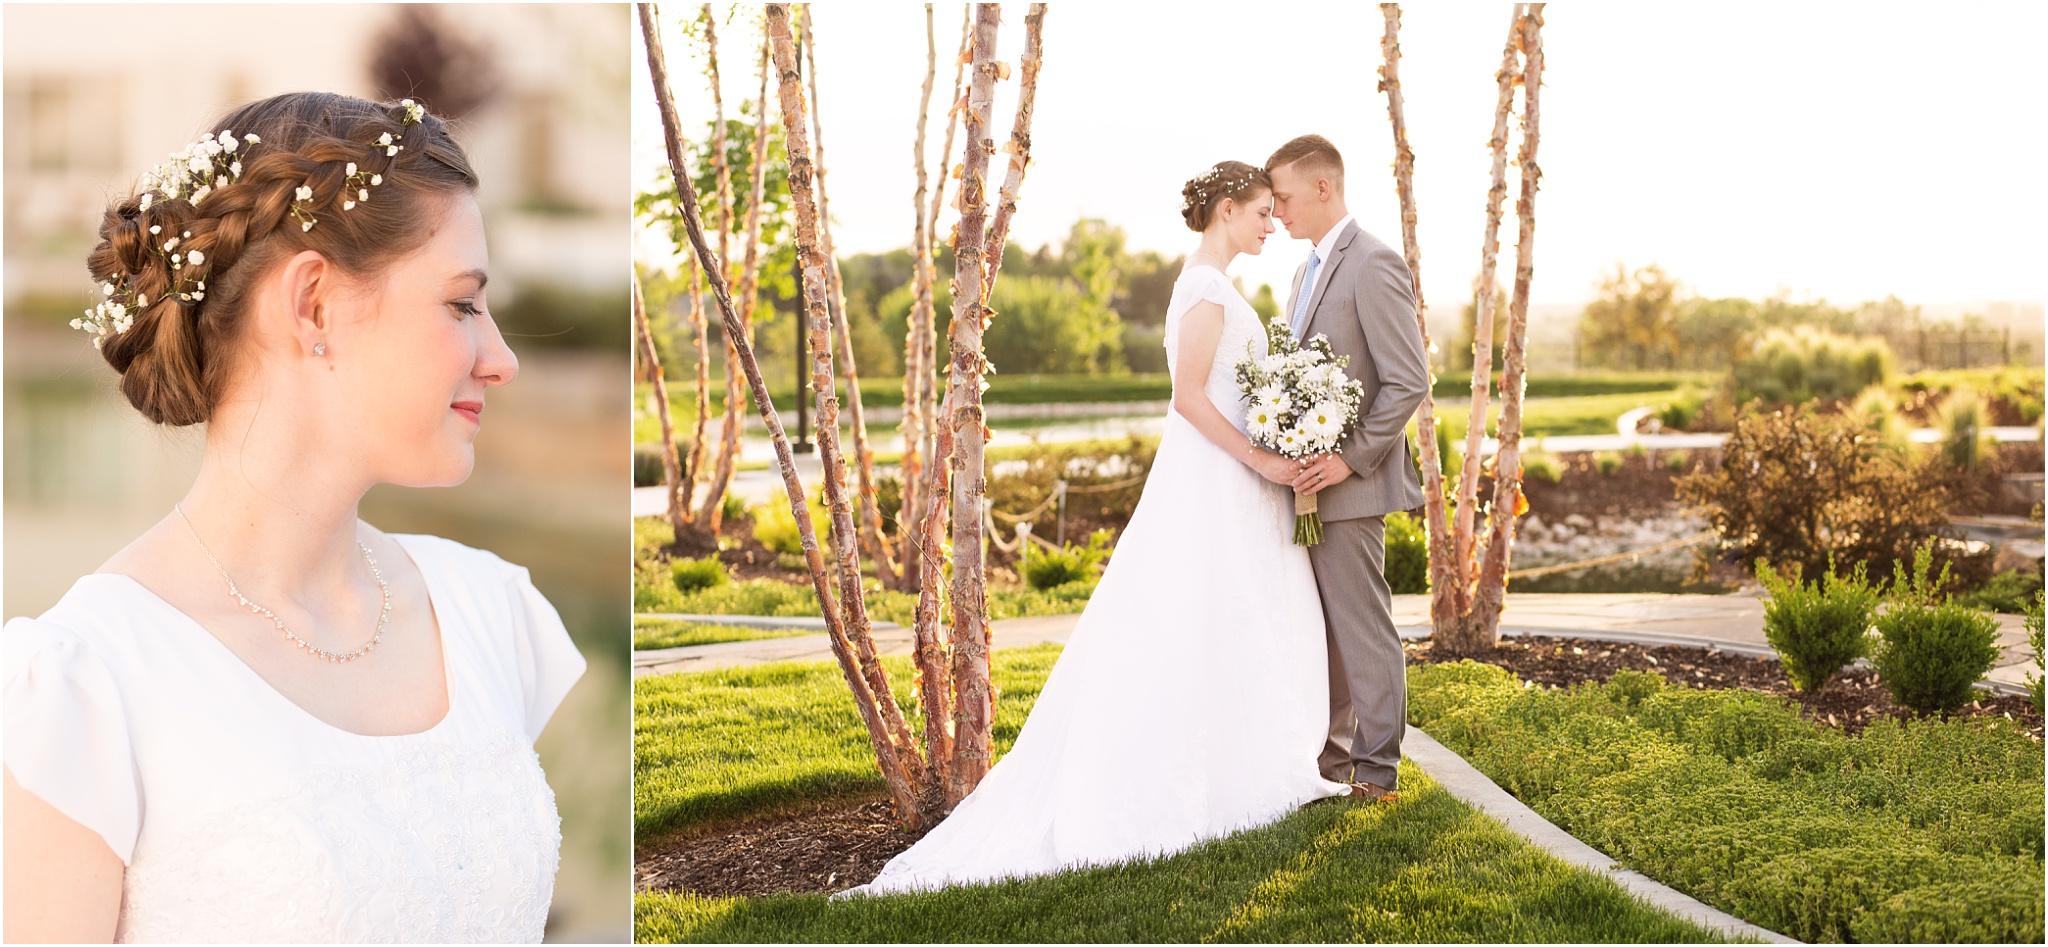 Wedding Photography_Meridian Idaho Temple_Boise Idaho_Leah Southwick Photography_0028.jpg